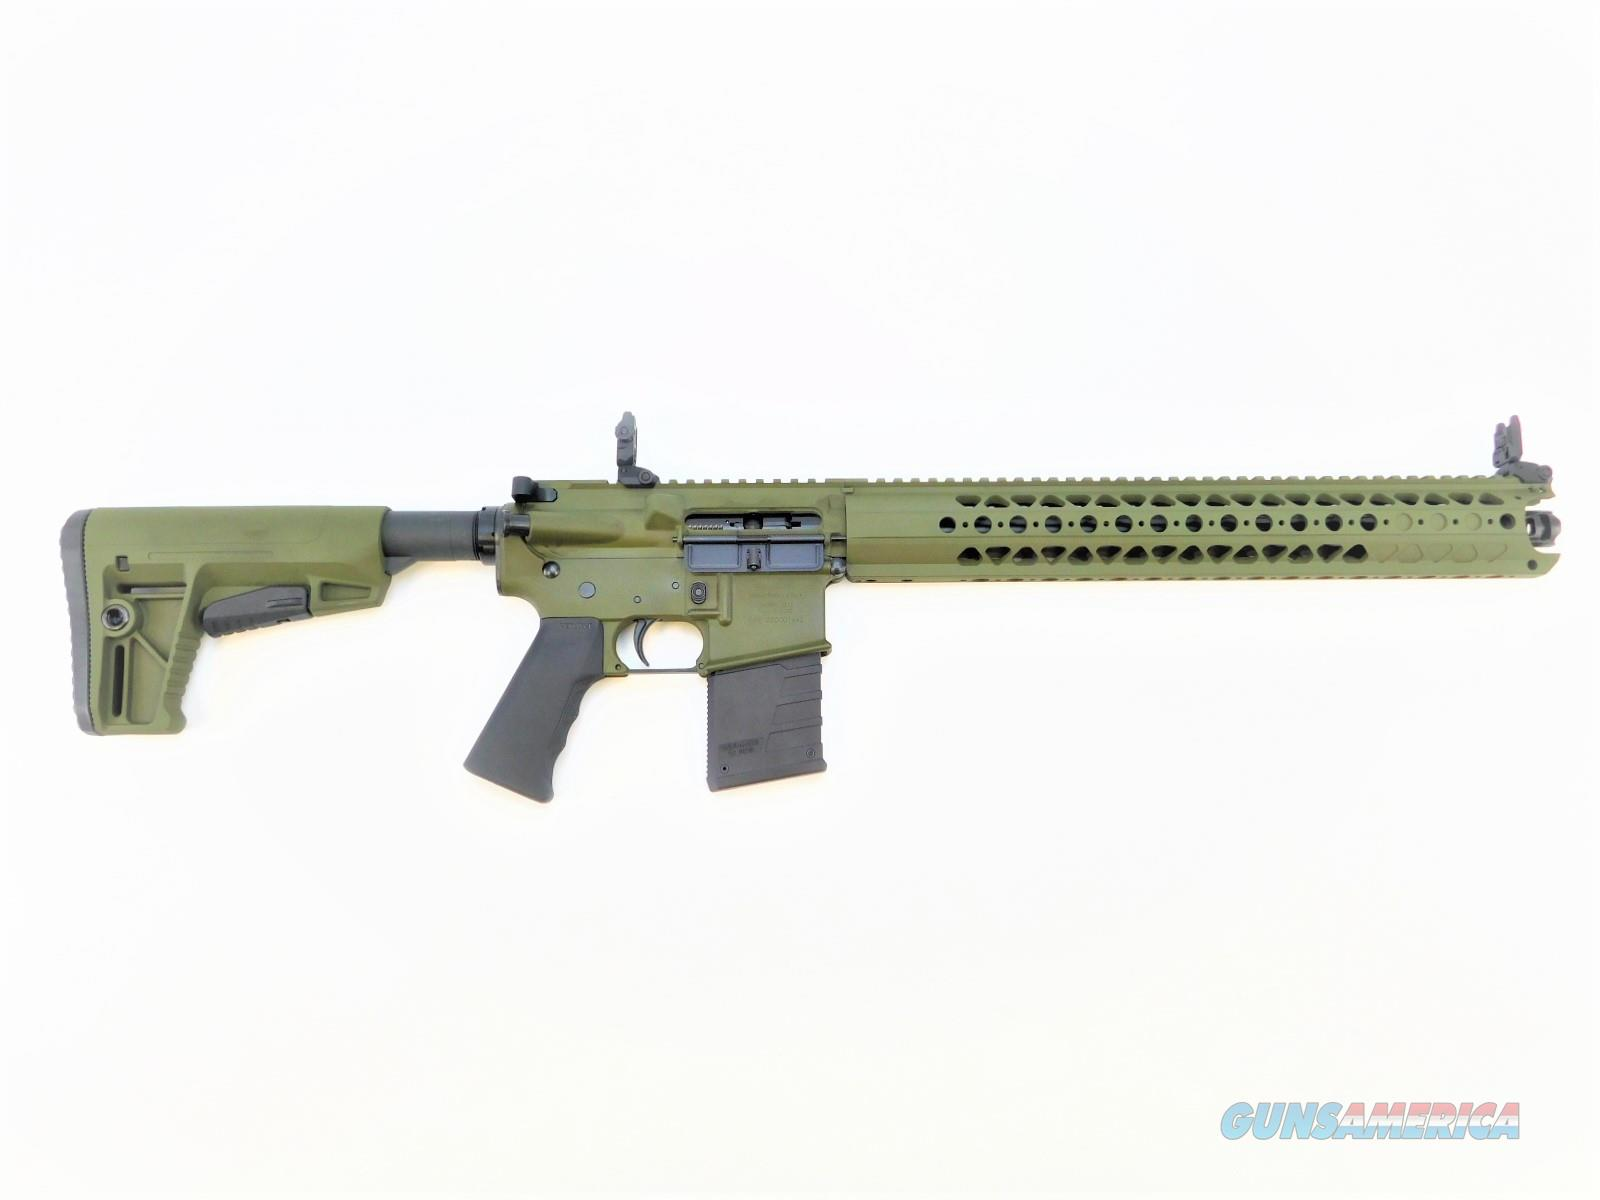 Kriss Defiance DMK22C ODG .22 LR DM22-CWSGR00  Guns > Rifles > Kriss Tactical Rifles